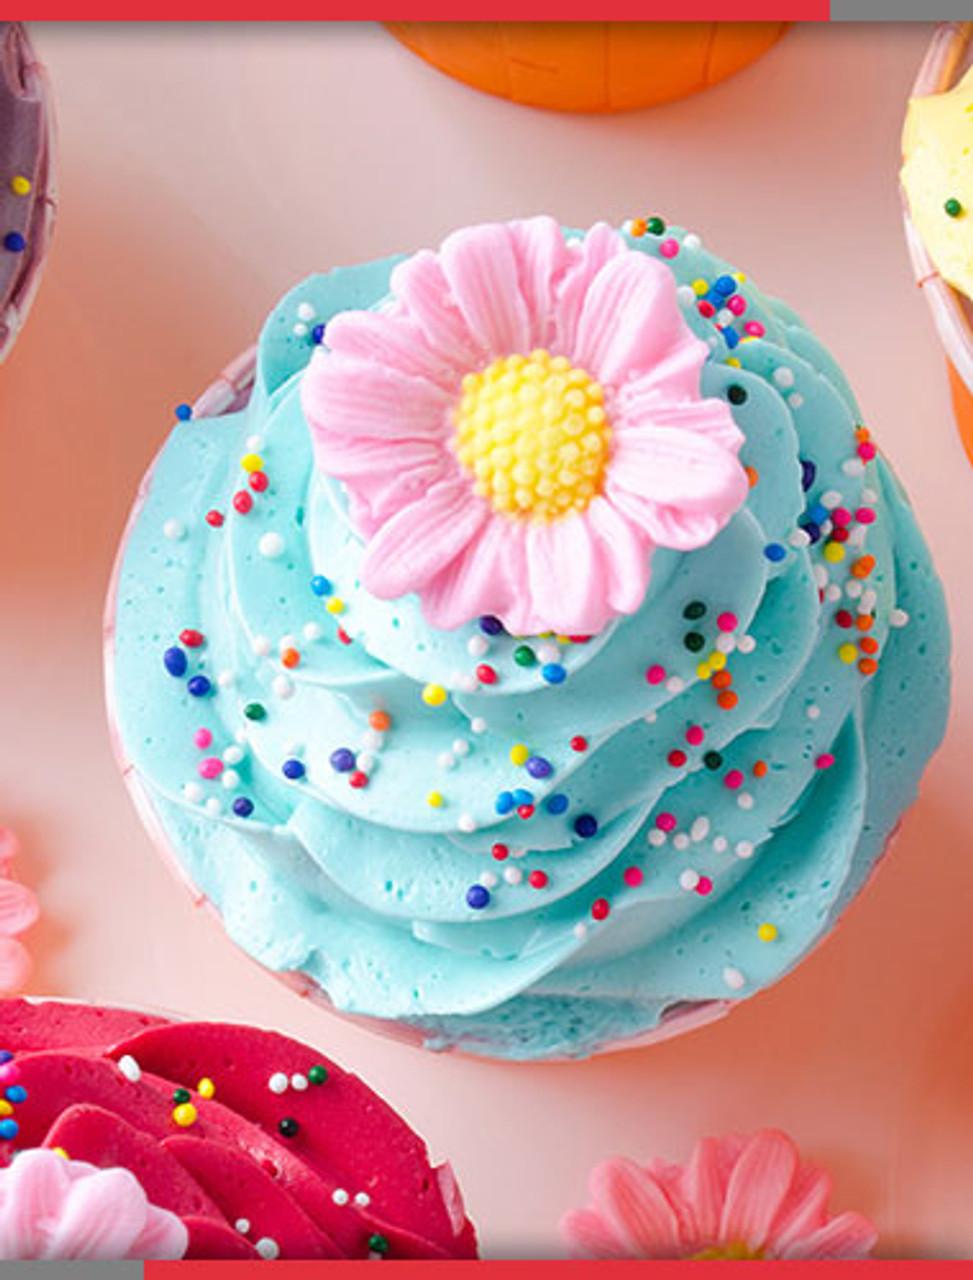 Birthday Cake Type 2 Flavoring